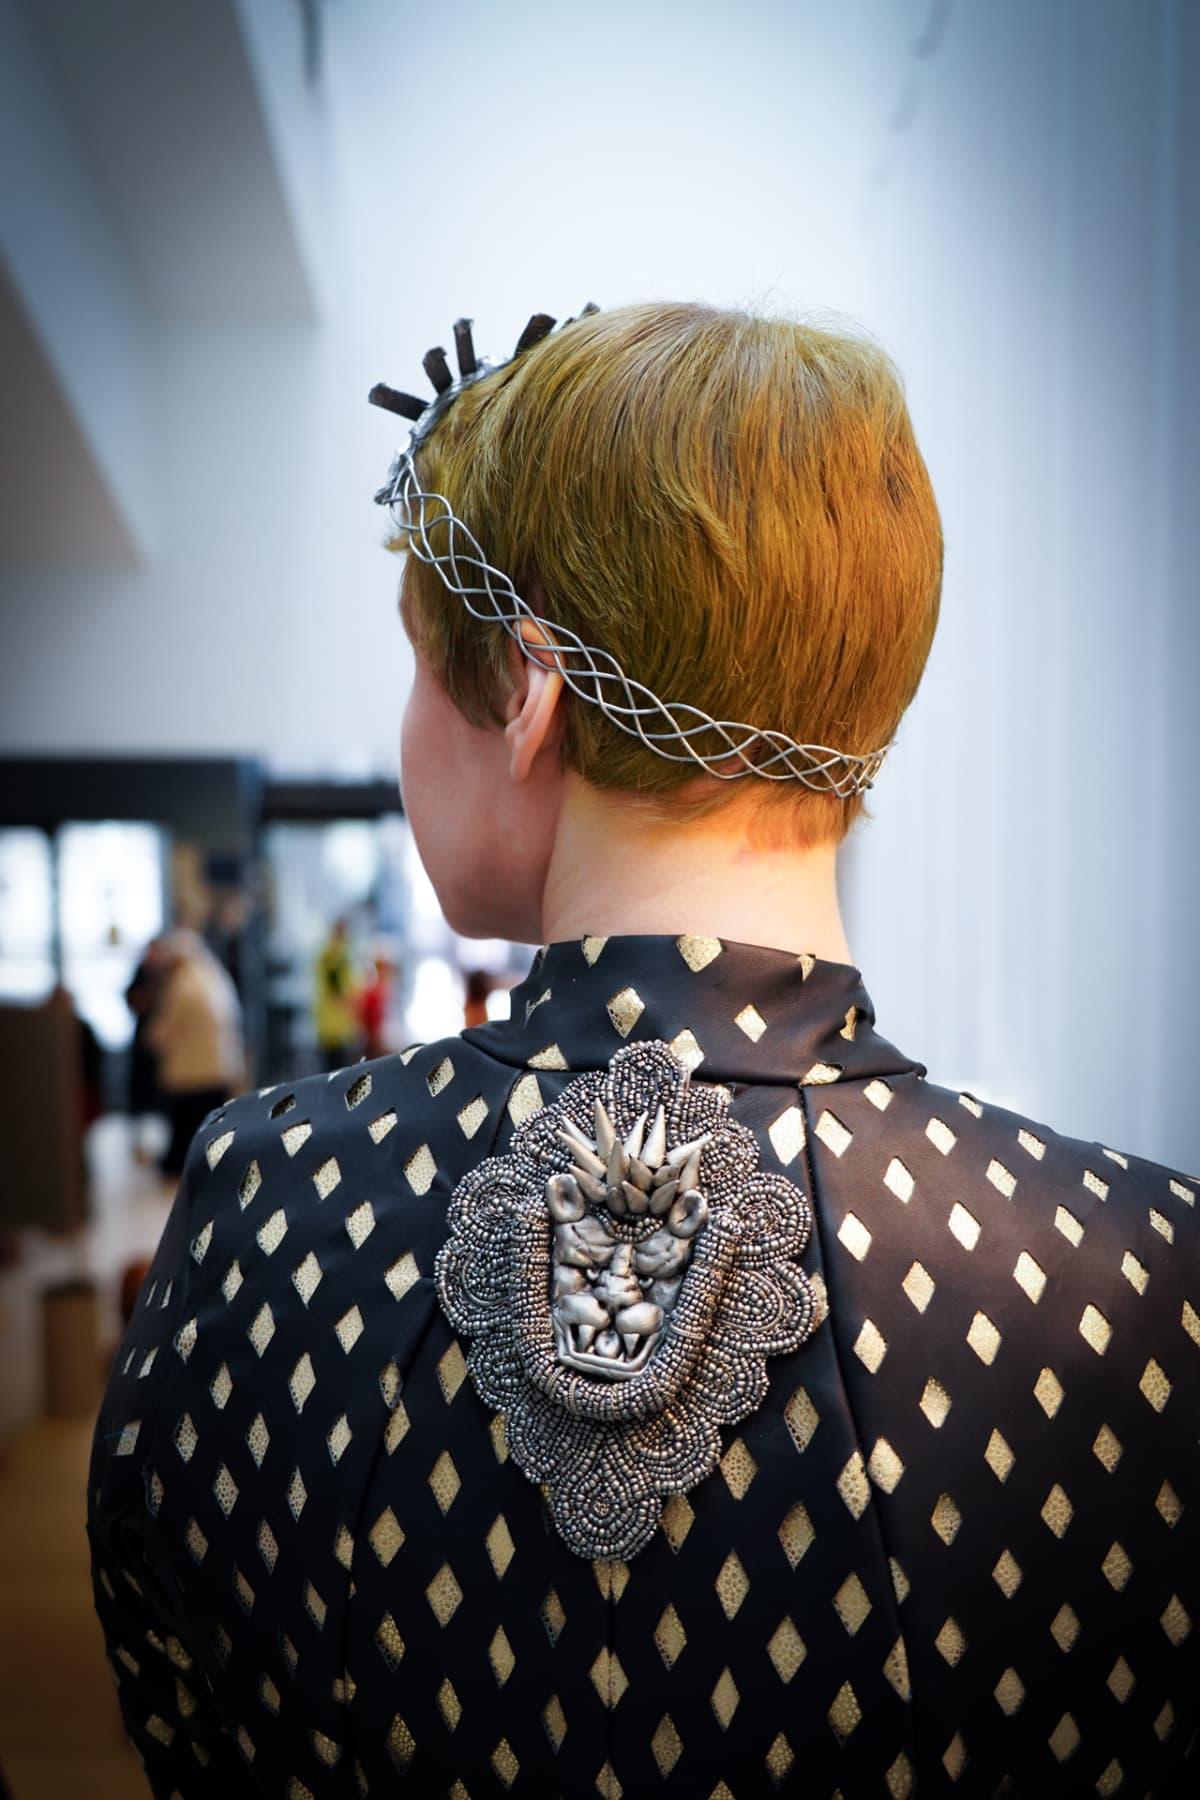 Popcult, Cersei Lannister, cosplay, Elisa Auvinen